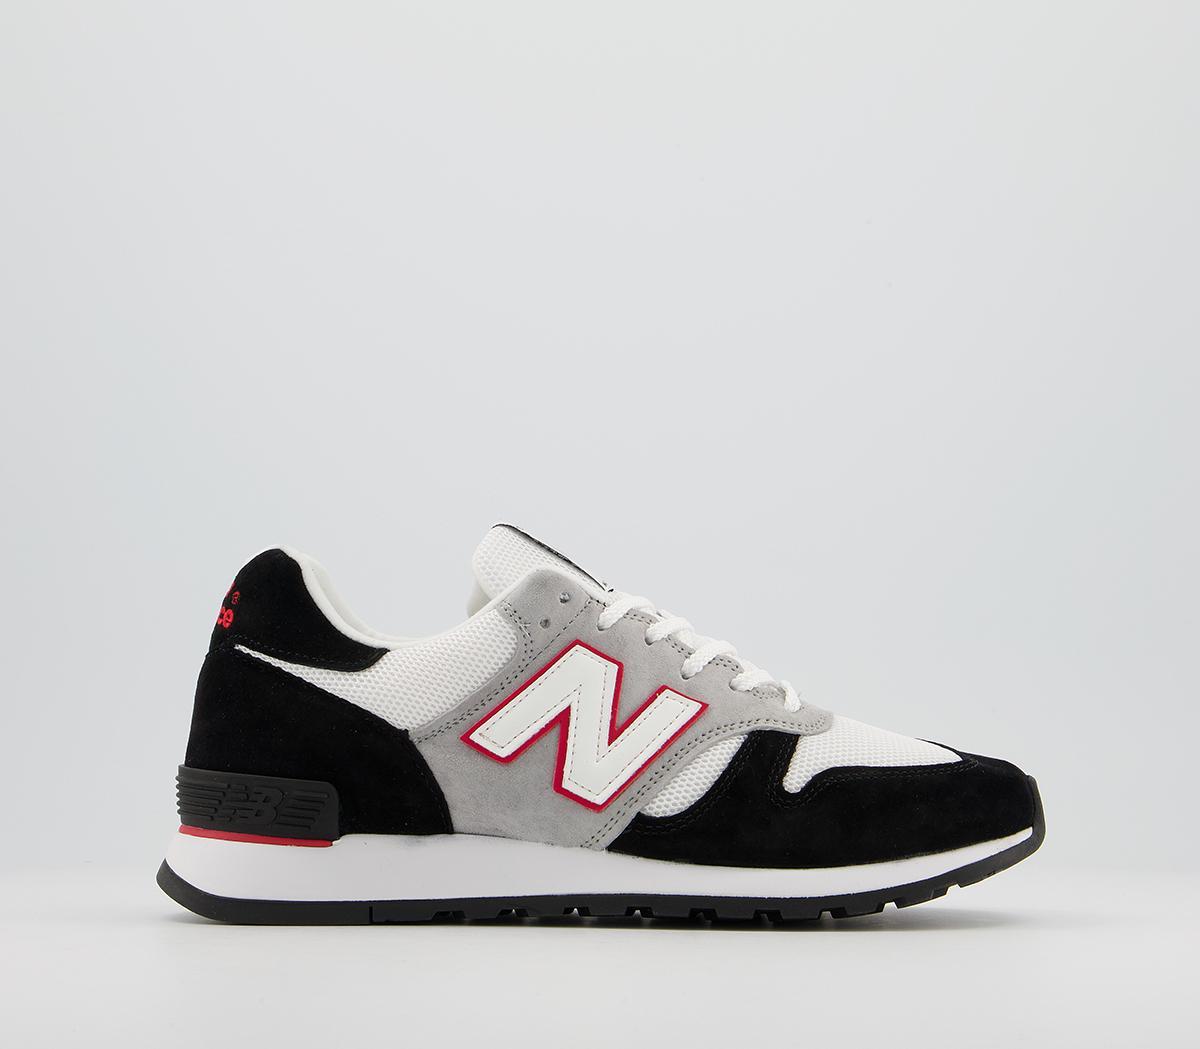 New Balance 670 Trainers